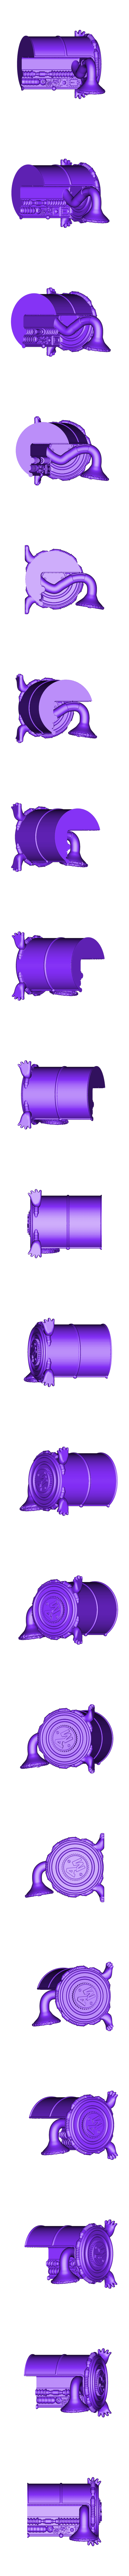 Steampunk_Support_Mobil_part02.stl Download STL file Steampunk support mobil. • 3D print template, Alphonse_Marcel